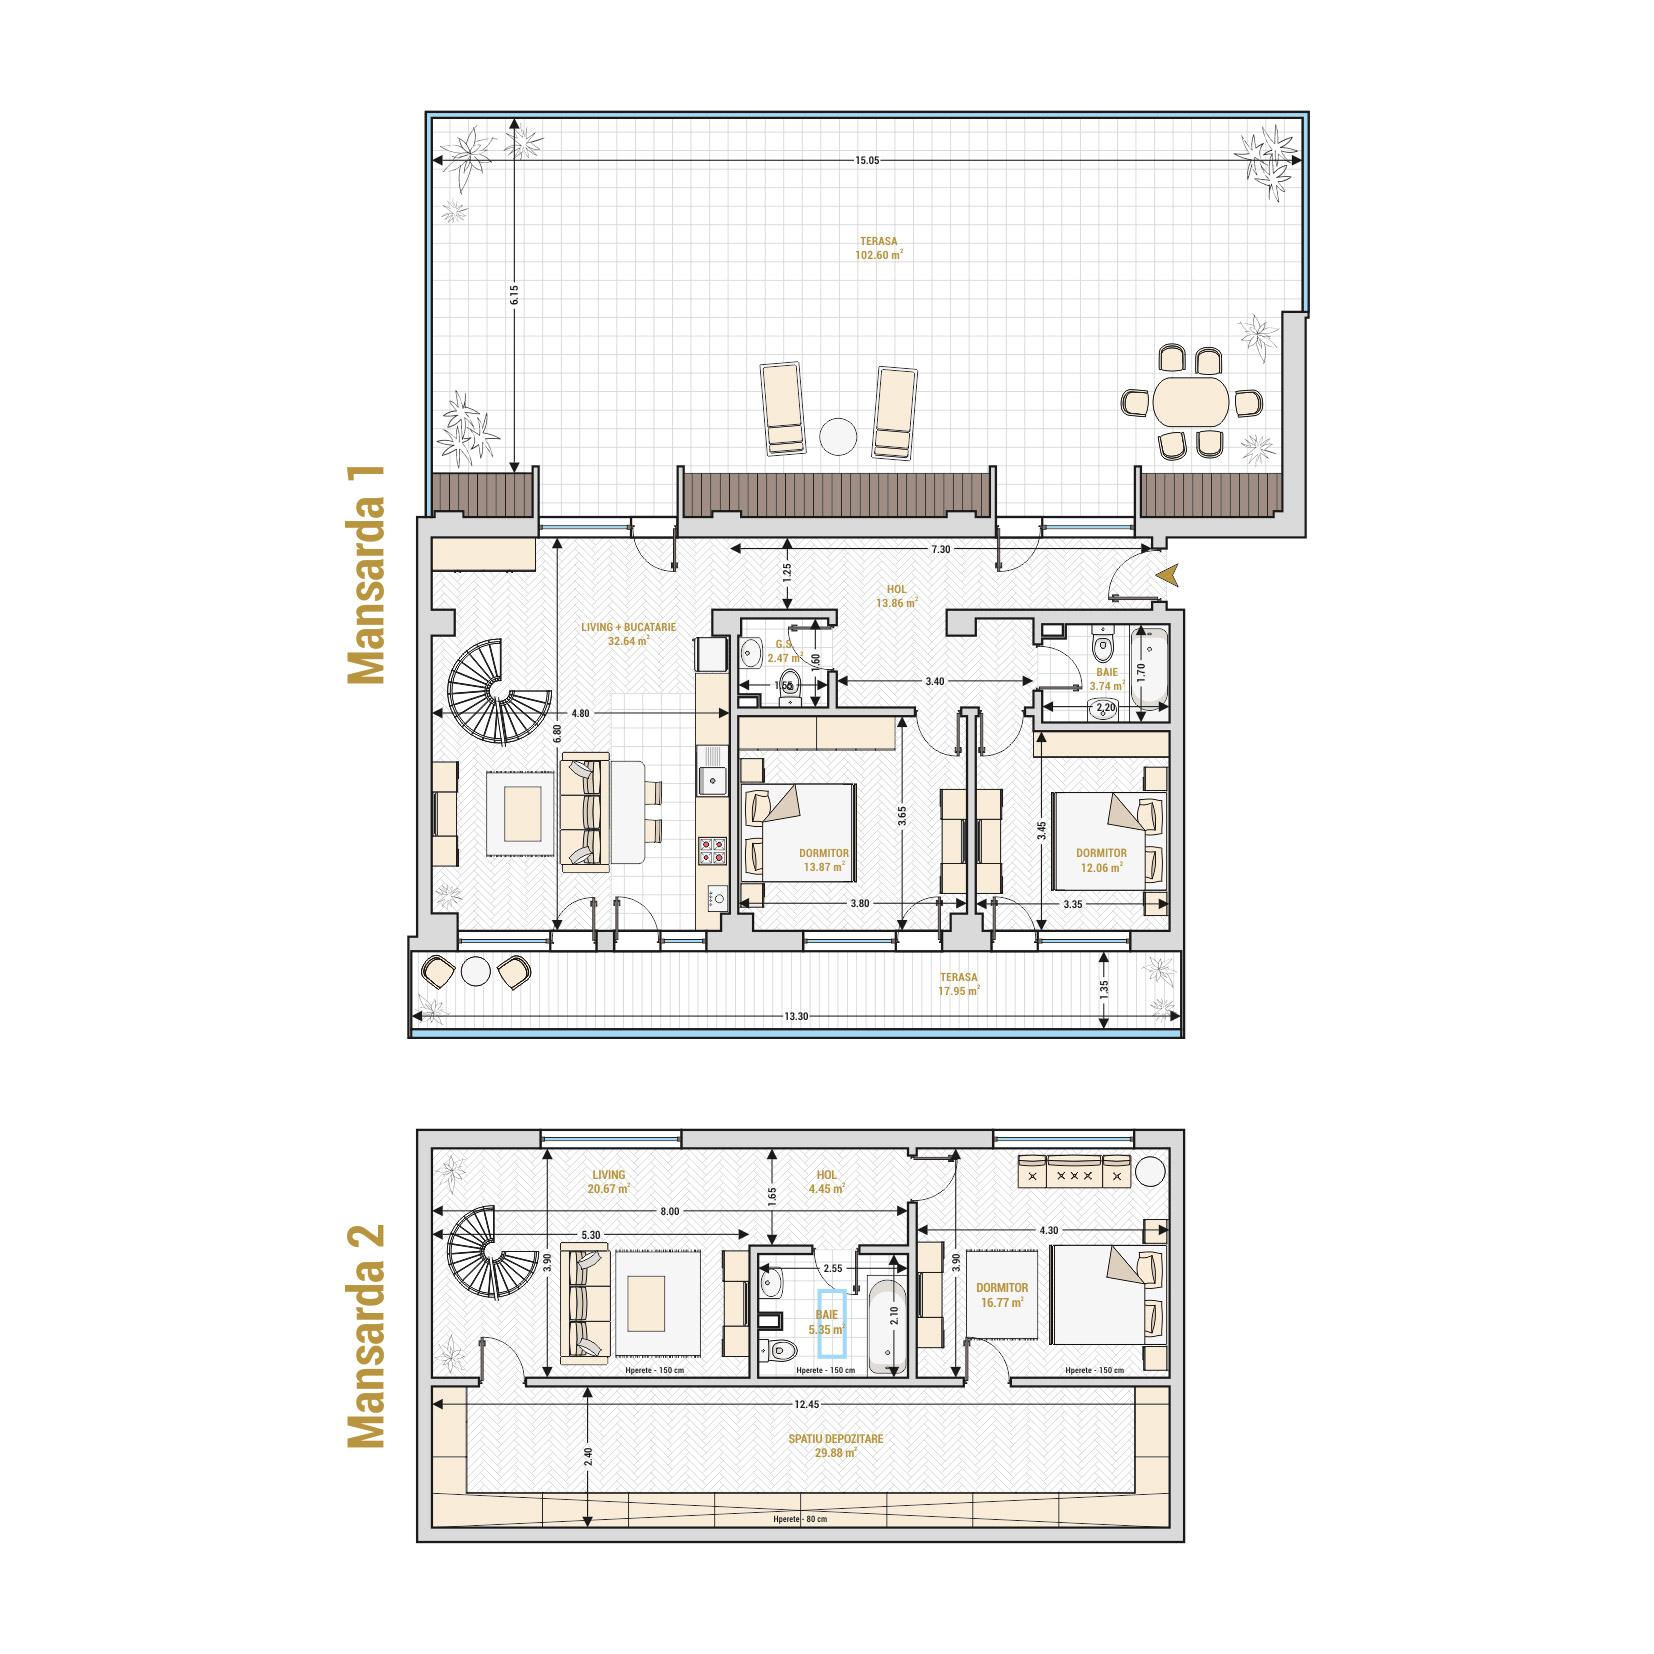 Duplex 5 camere de vanzare Bucuresti - Catedral Residence - Marriott, Piata Unirii, 13 Septembrie, Izvor - T2